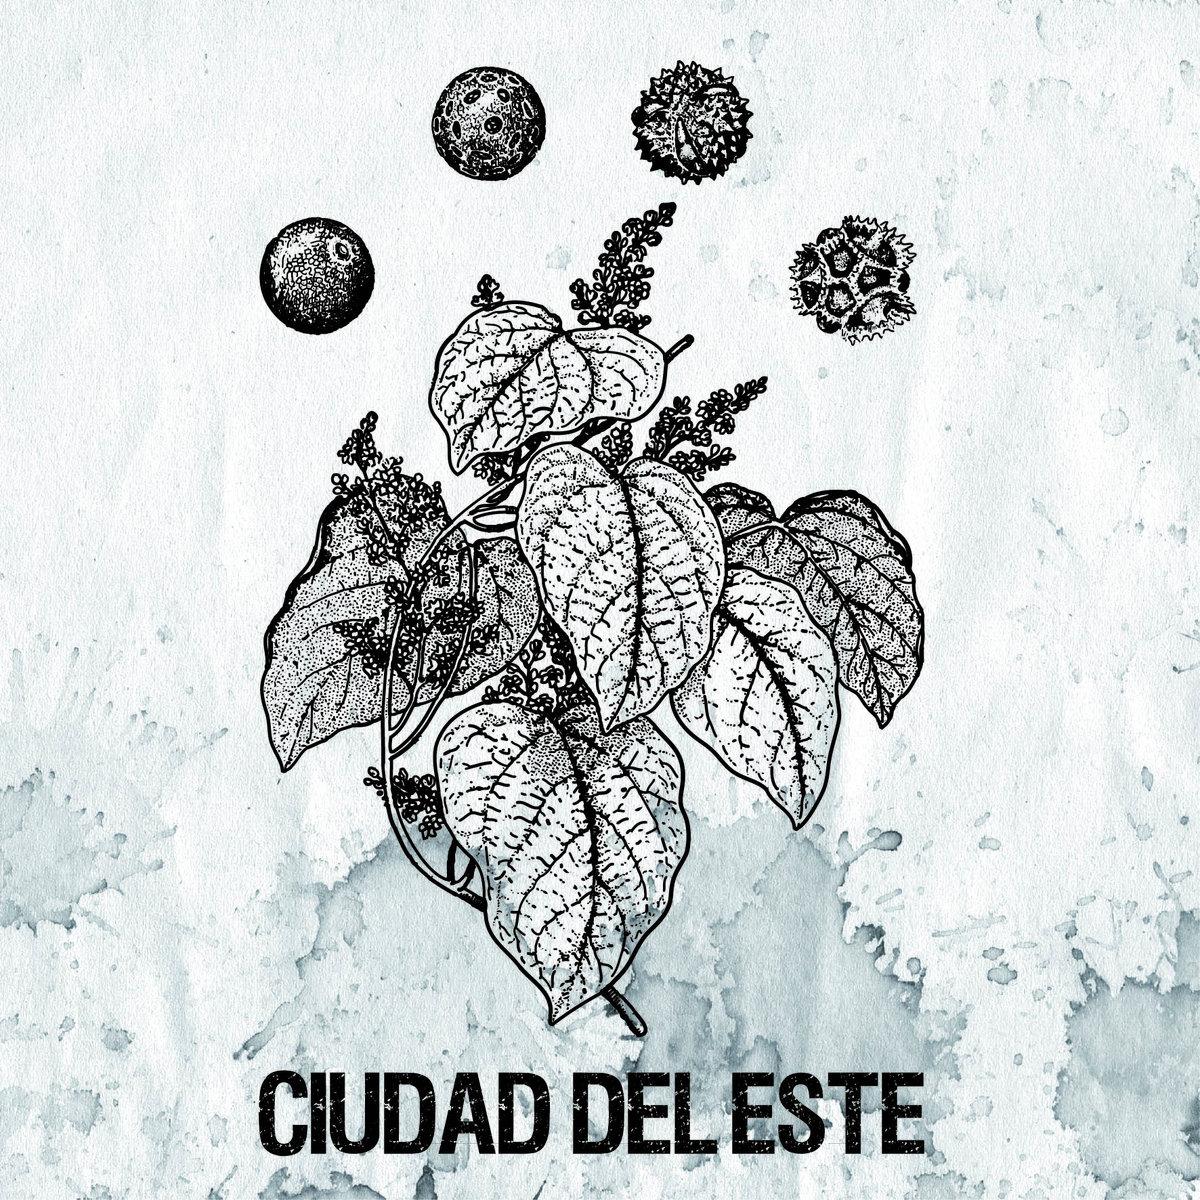 Discos - Ideo Music